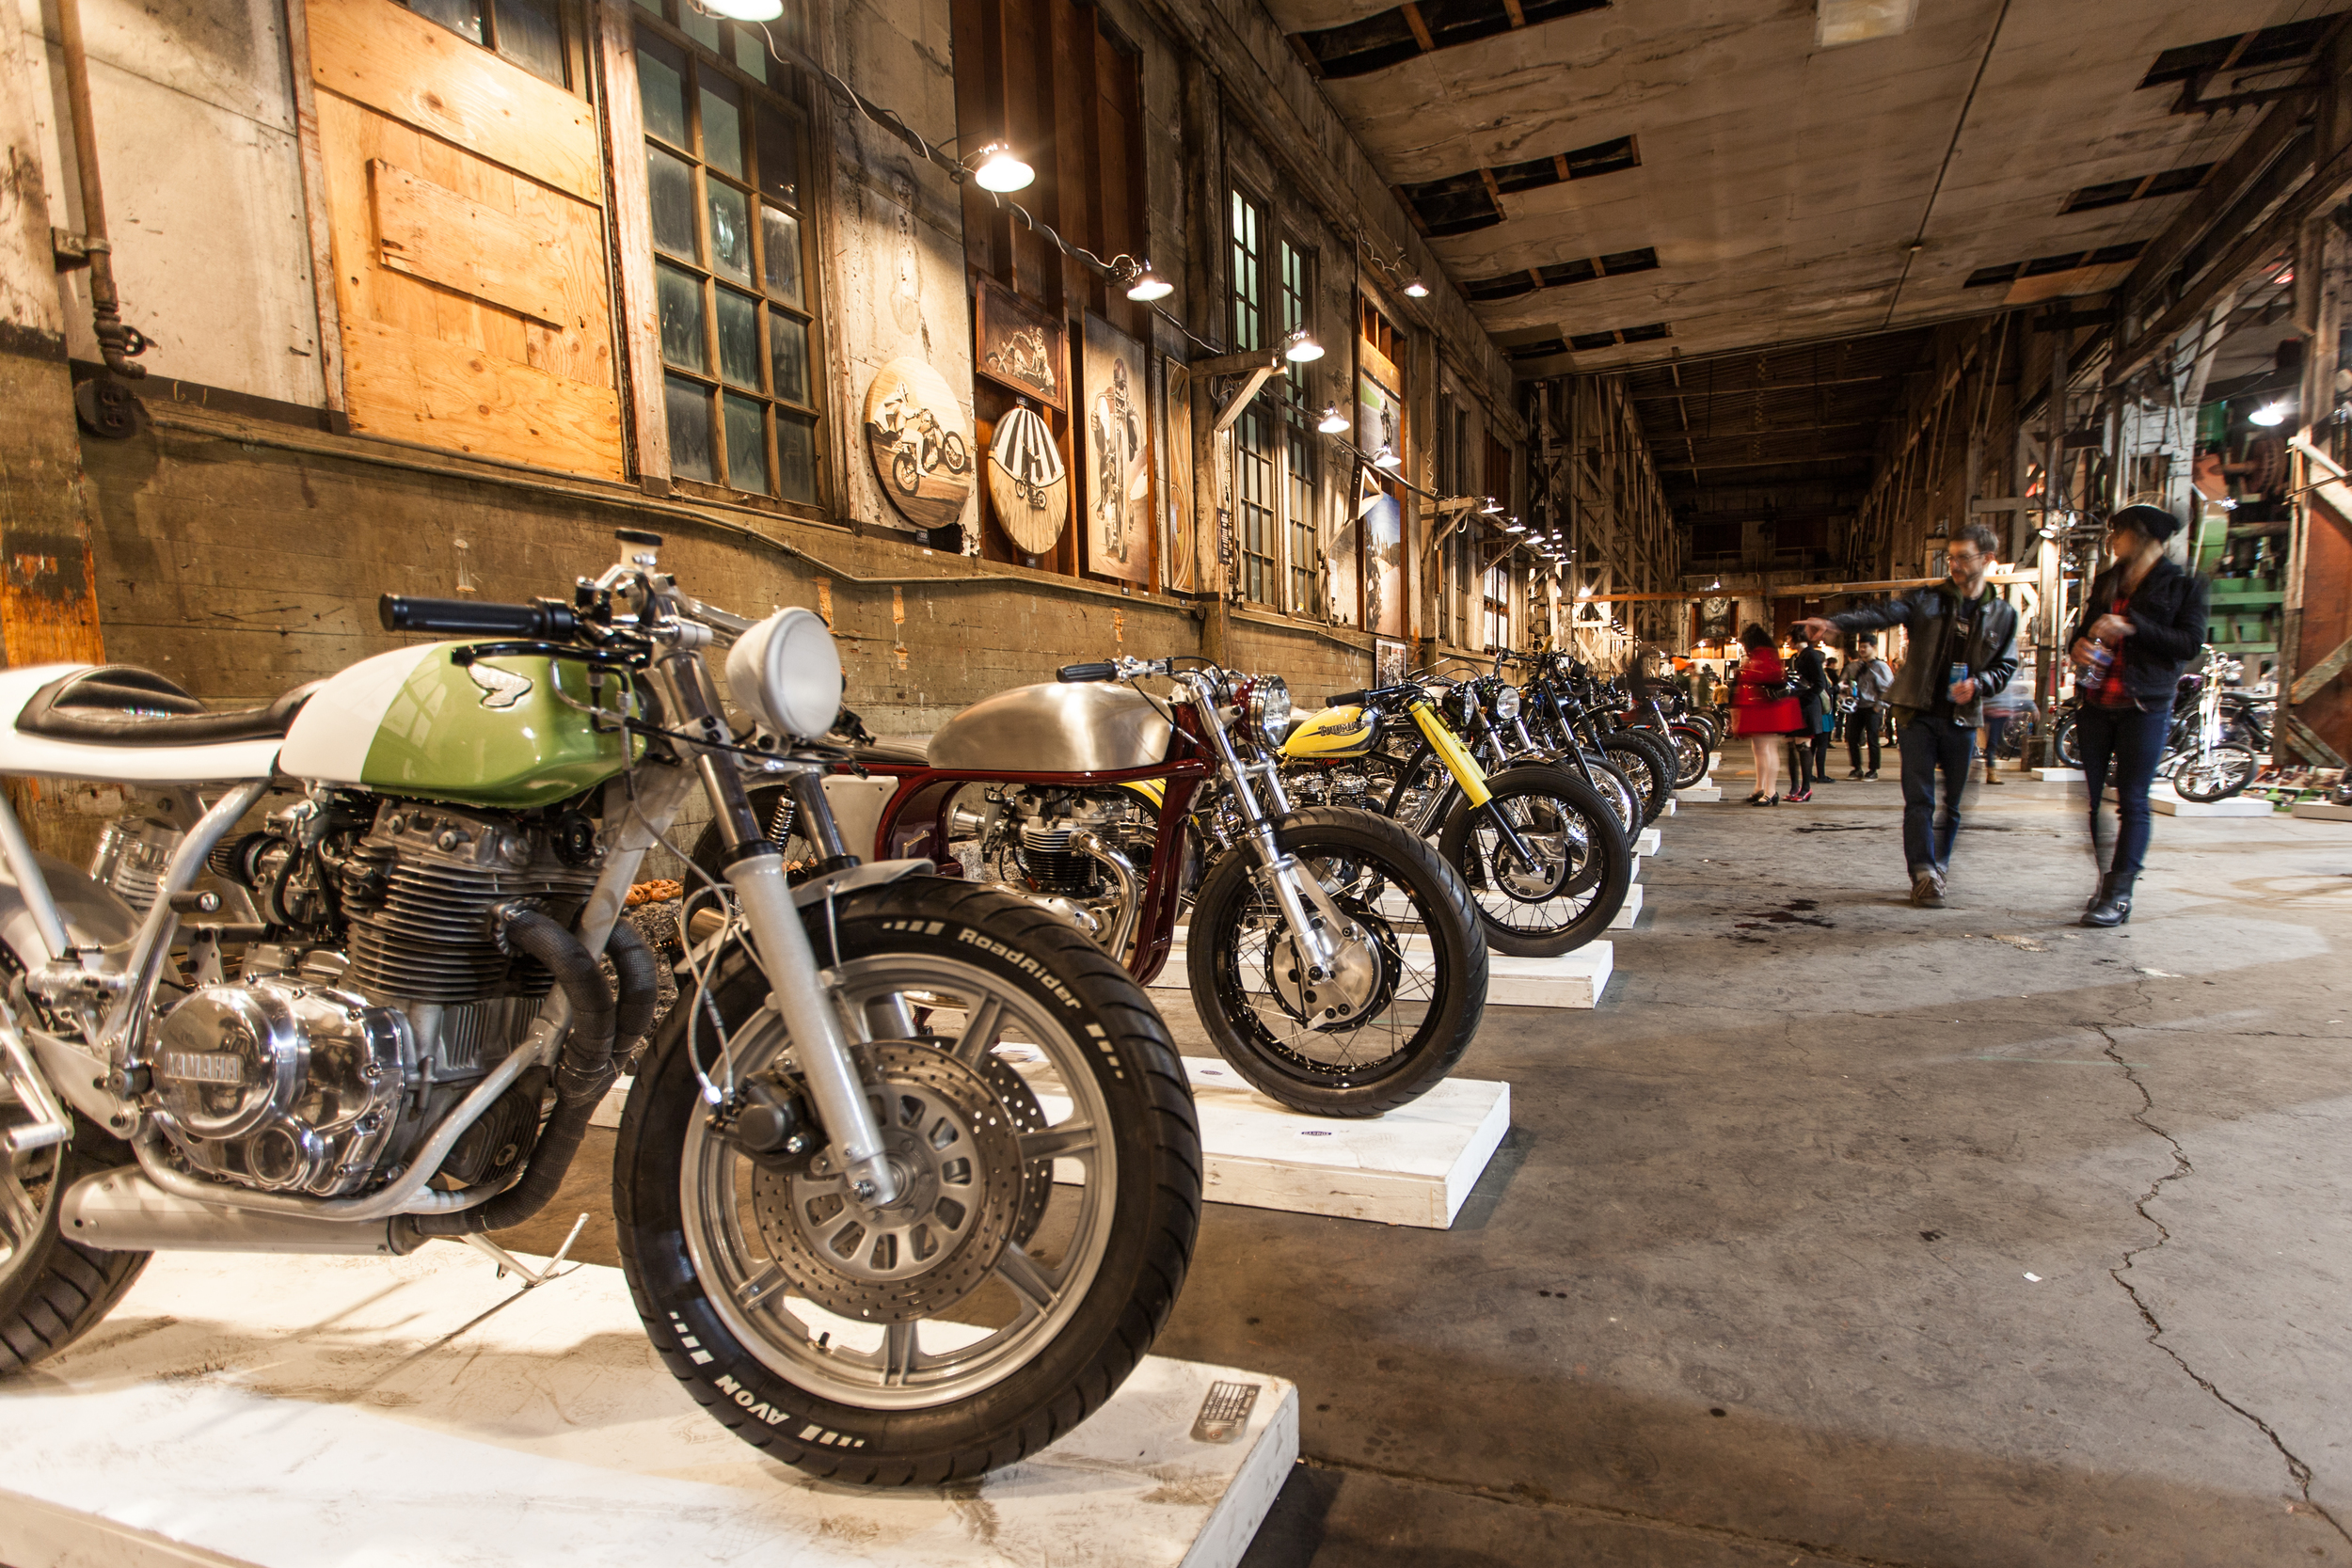 02-14-15 The 1 Moto Show - 2_-43-28.jpg